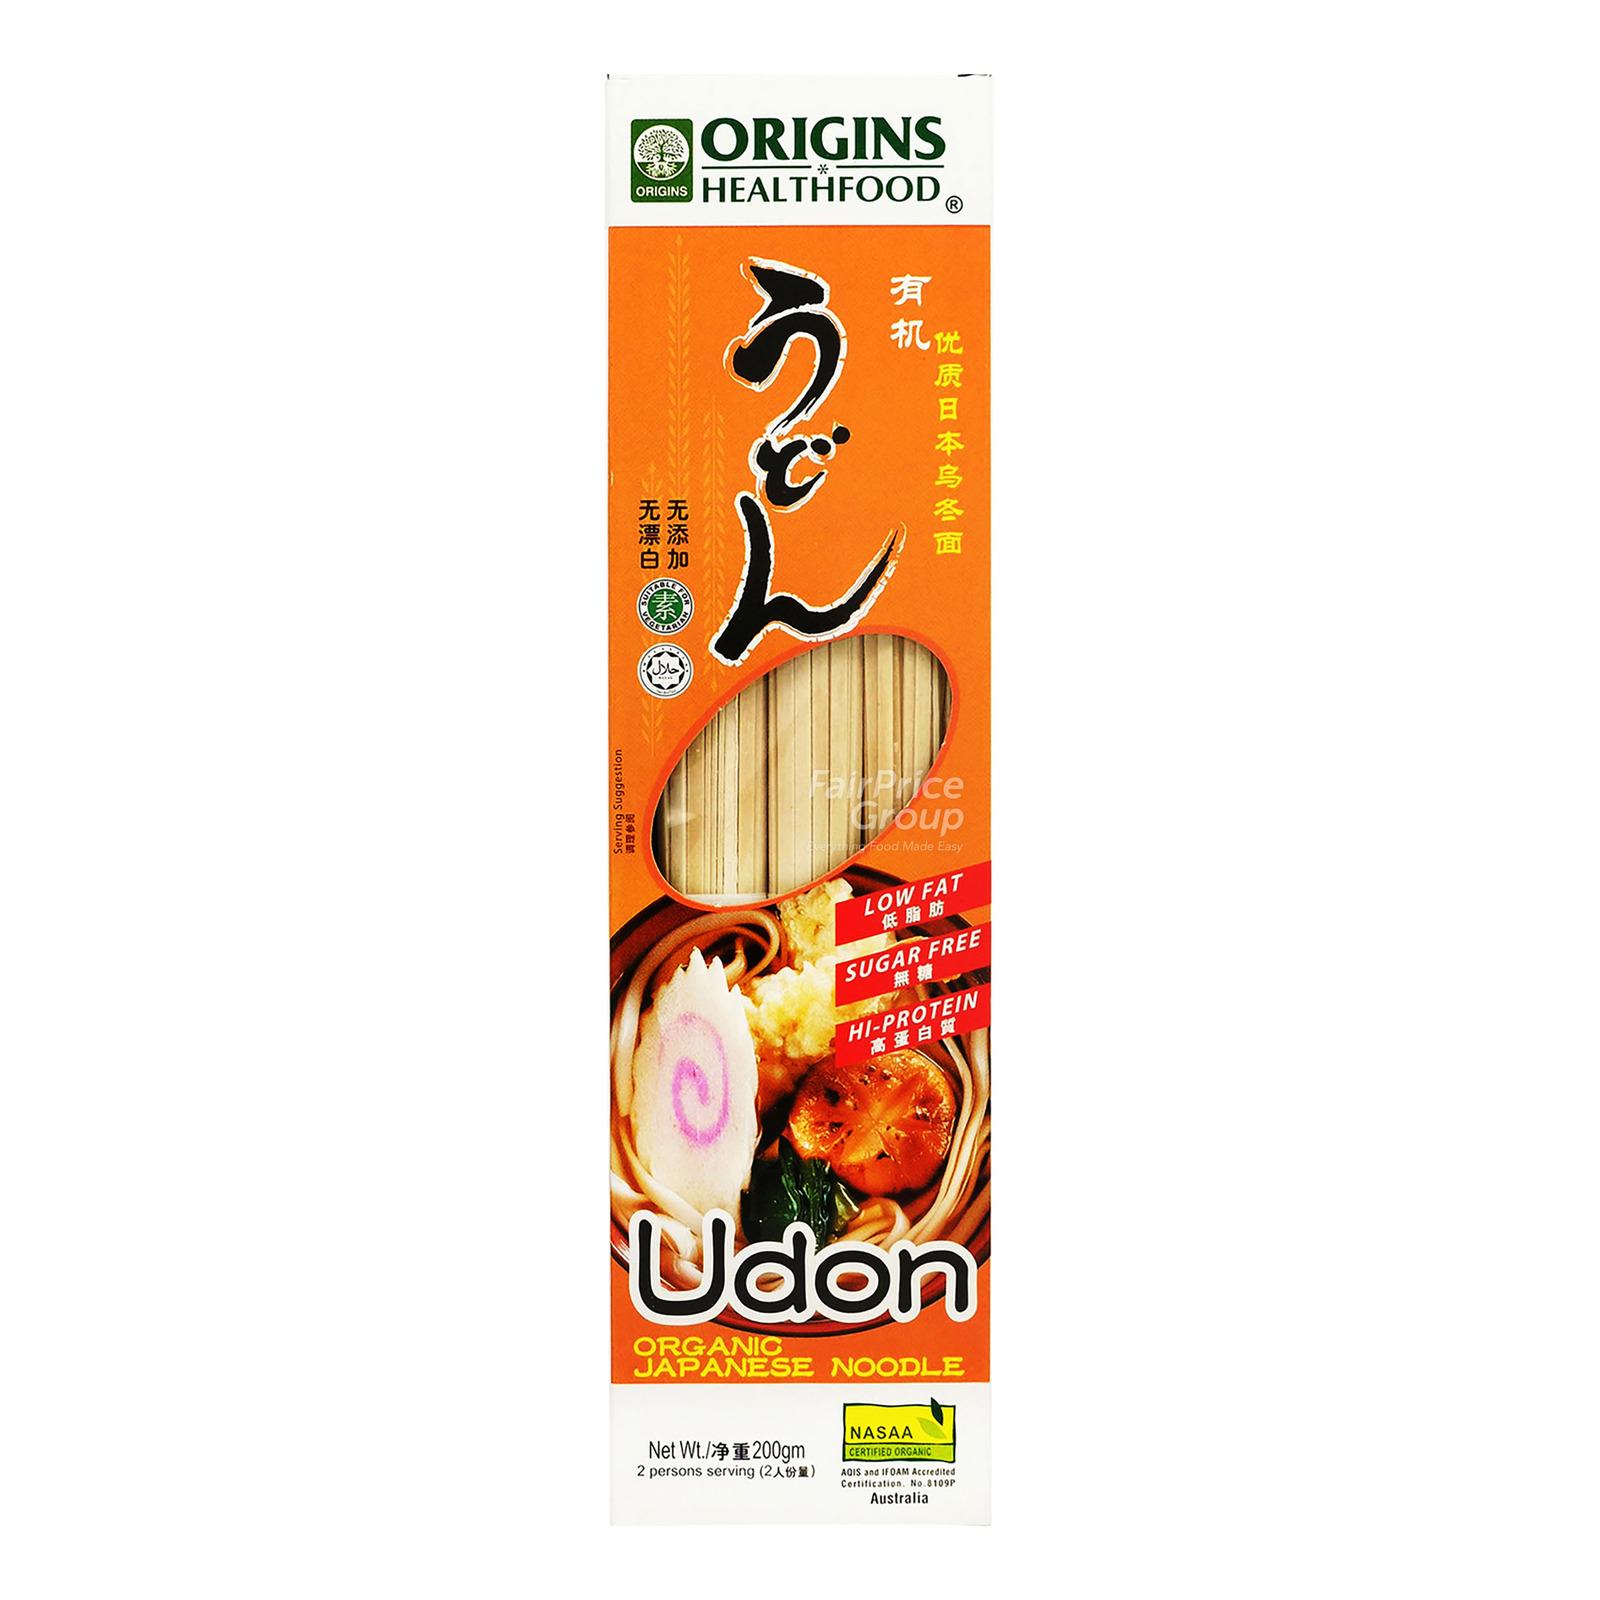 Origins Healthfood Organic Japanese Noodle - Udon